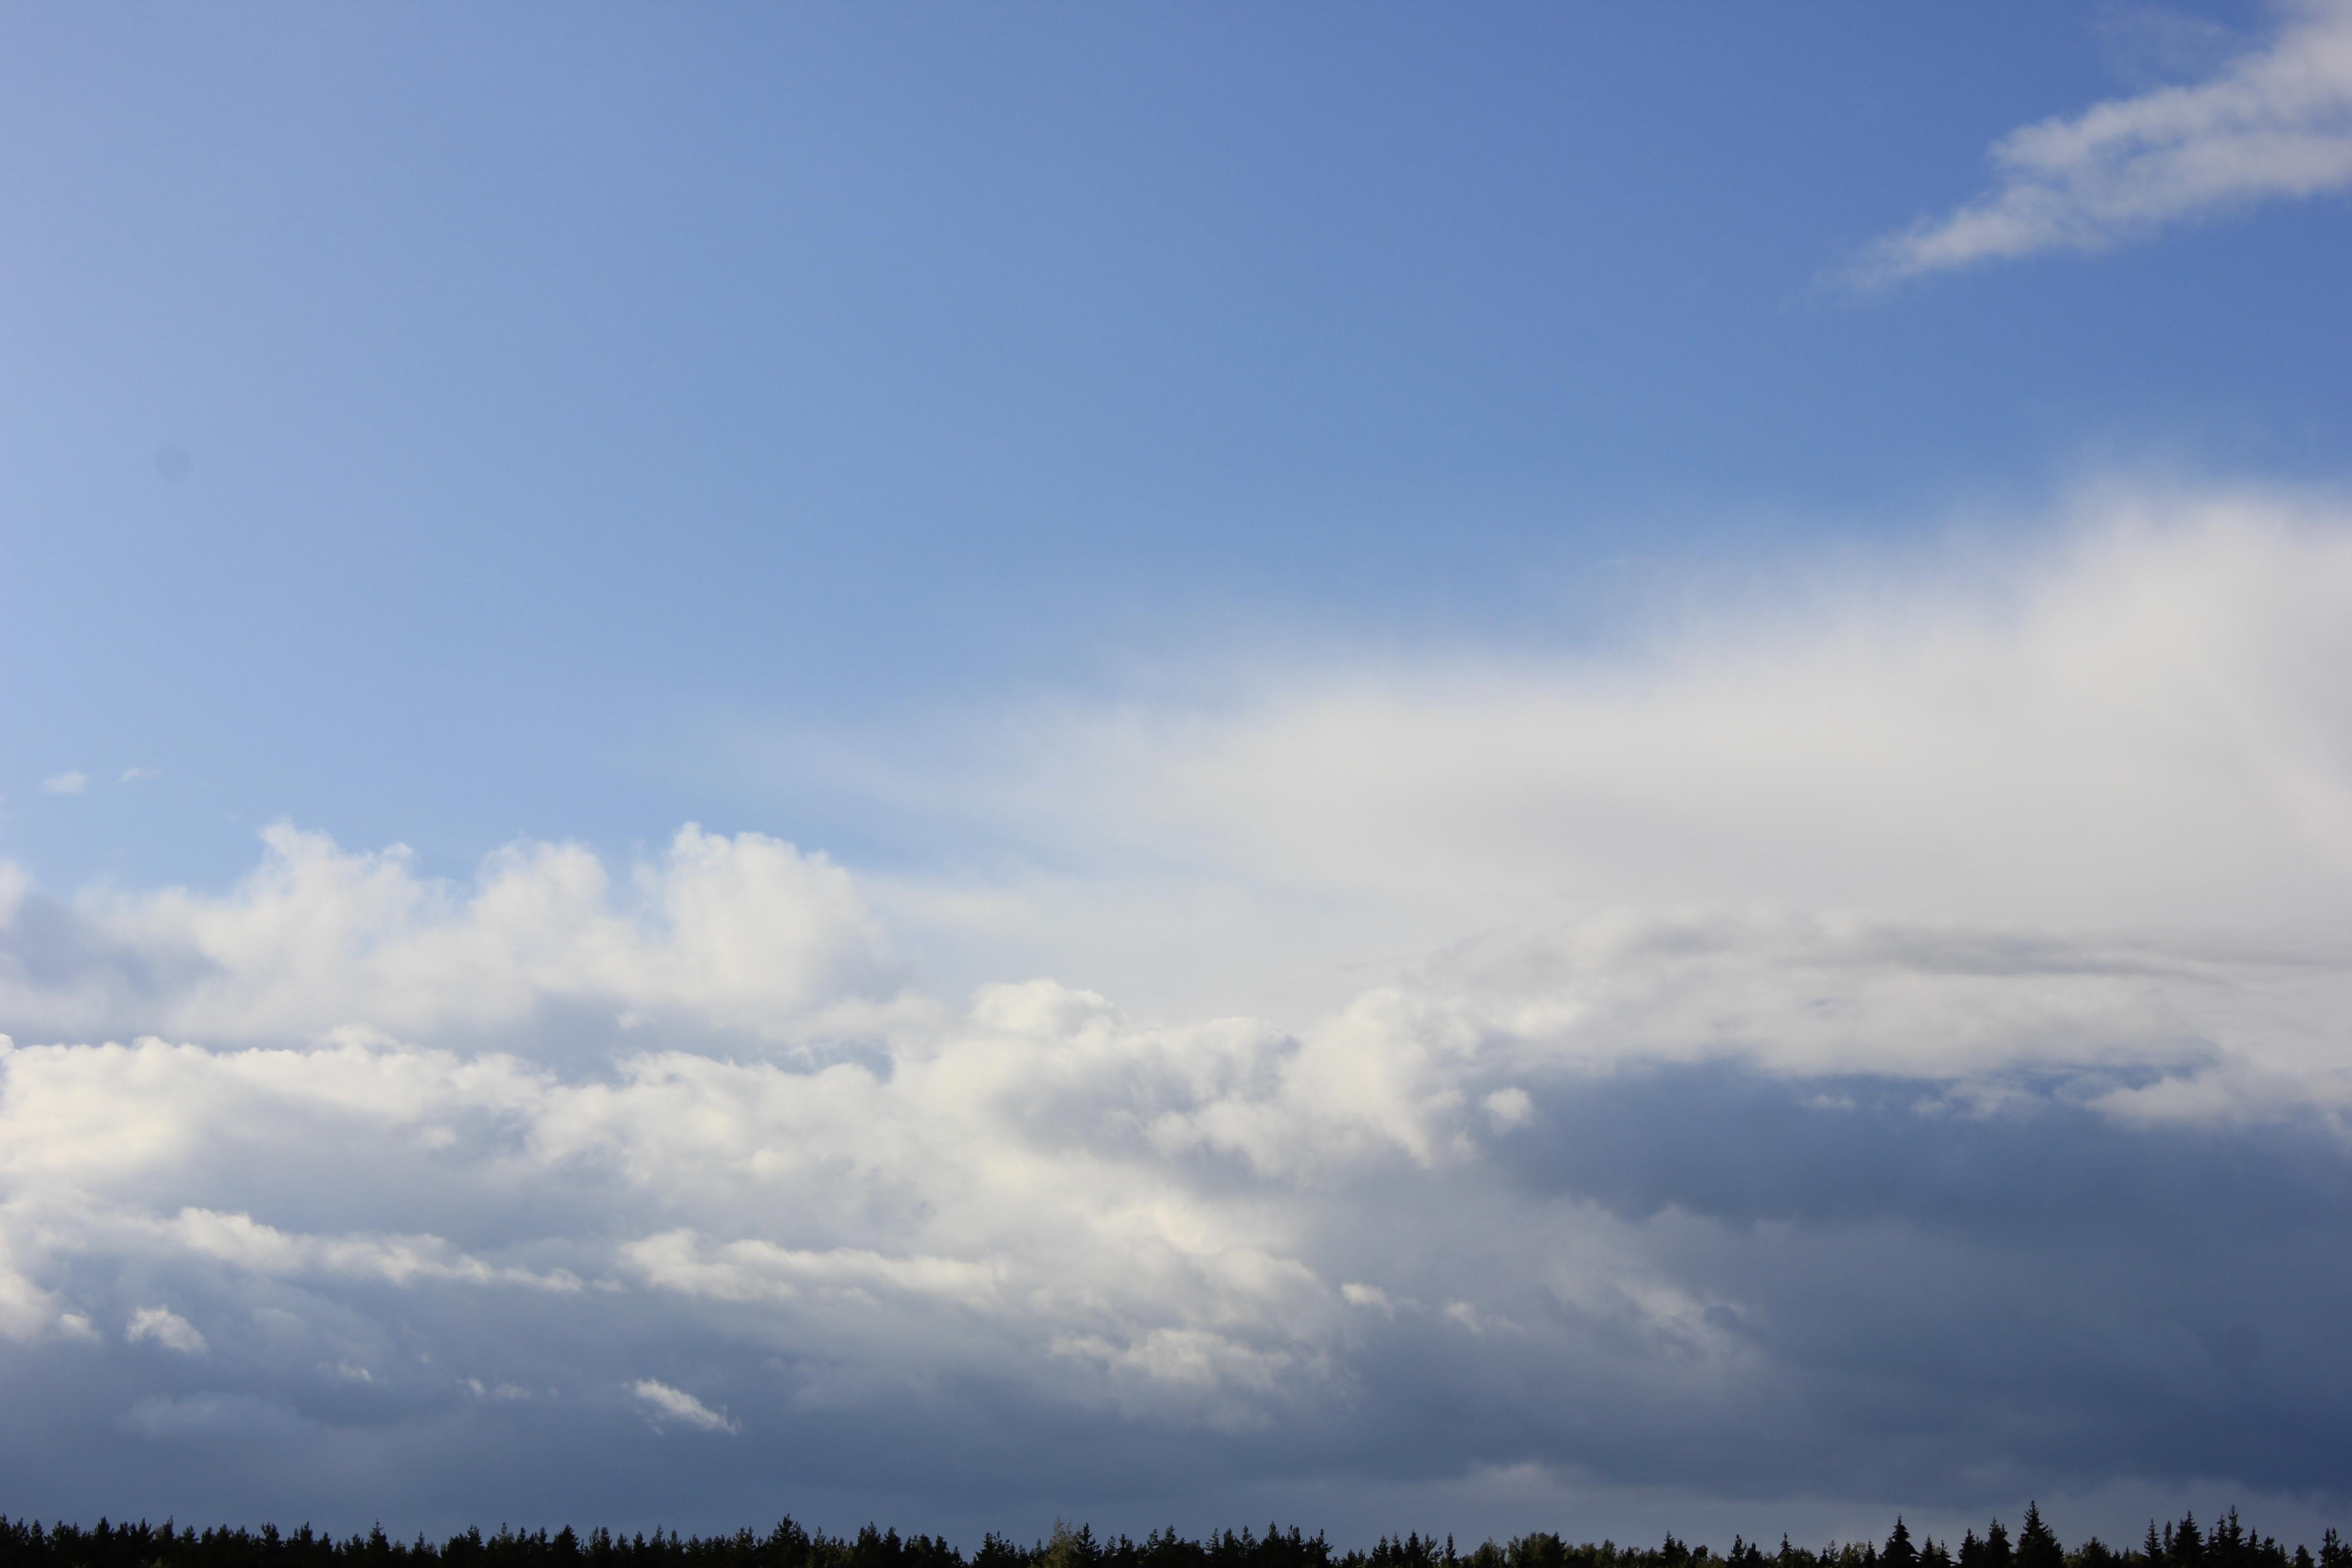 прелести небо сентября (9)